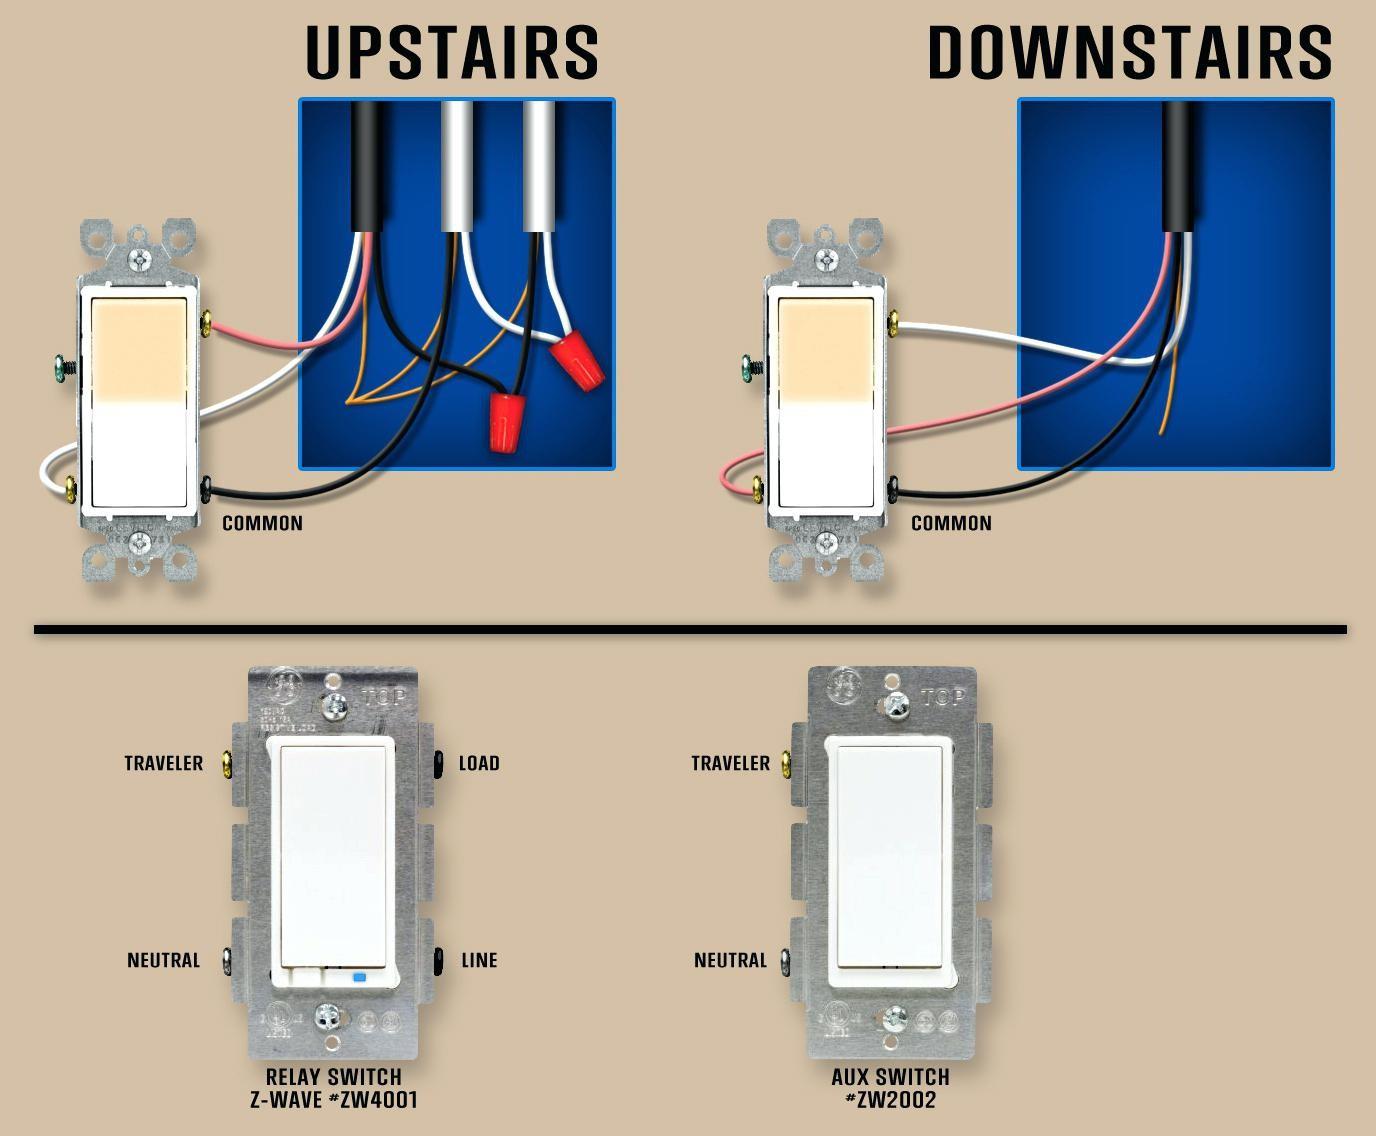 [ZHKZ_3066]  Leviton Dimmer Switch Wire Diagram 7 Pin Trailer Plug Wiring Diagram For  Dodge - evo-source.tembak-andas4.the-rocks.it | Leviton Dimmer Switch Wiring Diagram |  | Wiring Diagram and Schematics Source - Bege Wiring Diagram Source Full  Edition